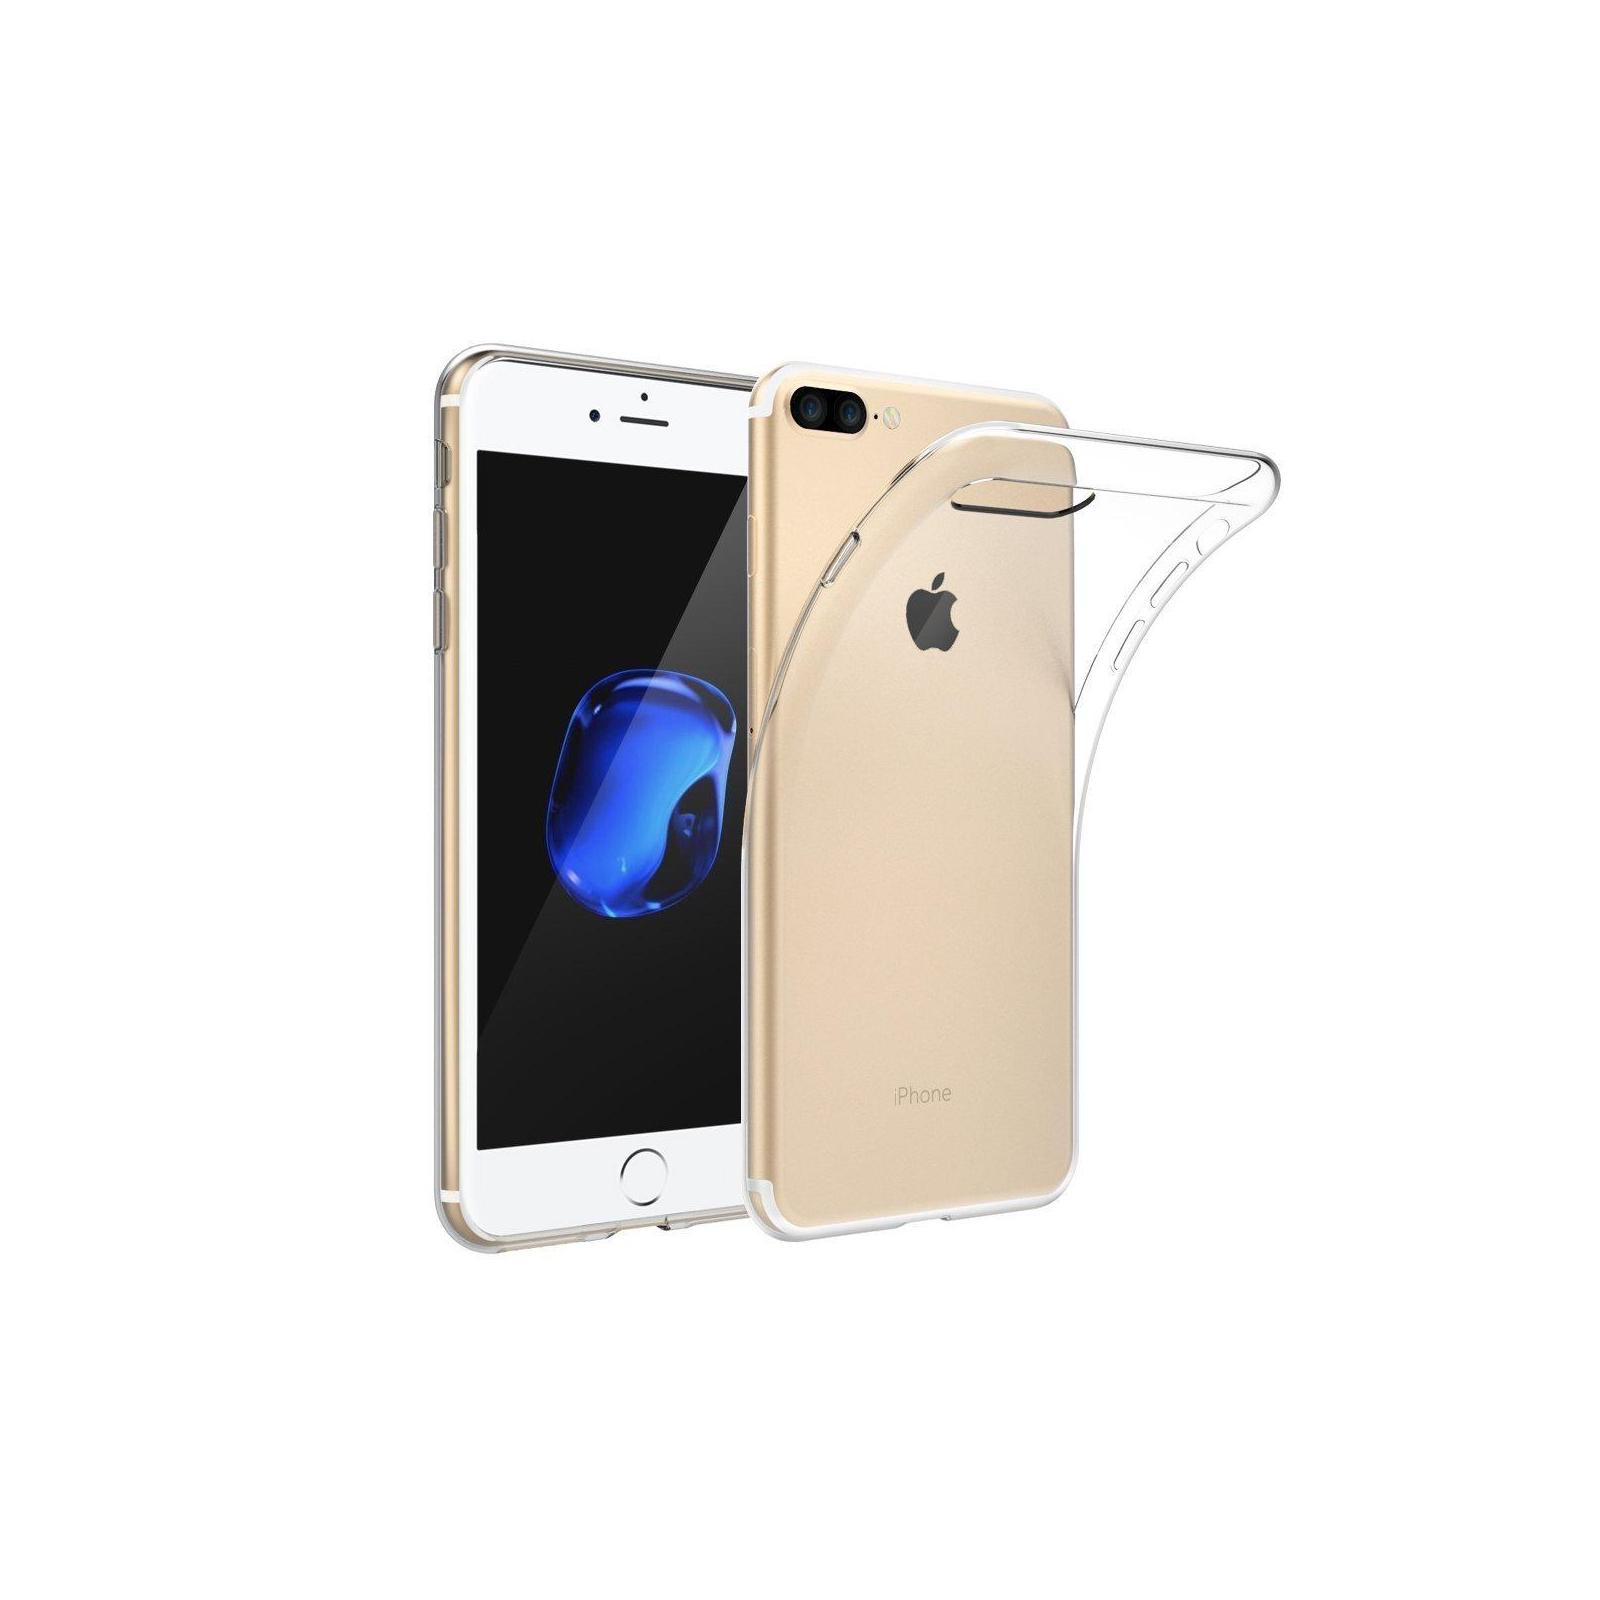 Чехол для моб. телефона Laudtec для iPhone 7/8 Plus Clear tpu (Transperent) (LC-IP78PST)